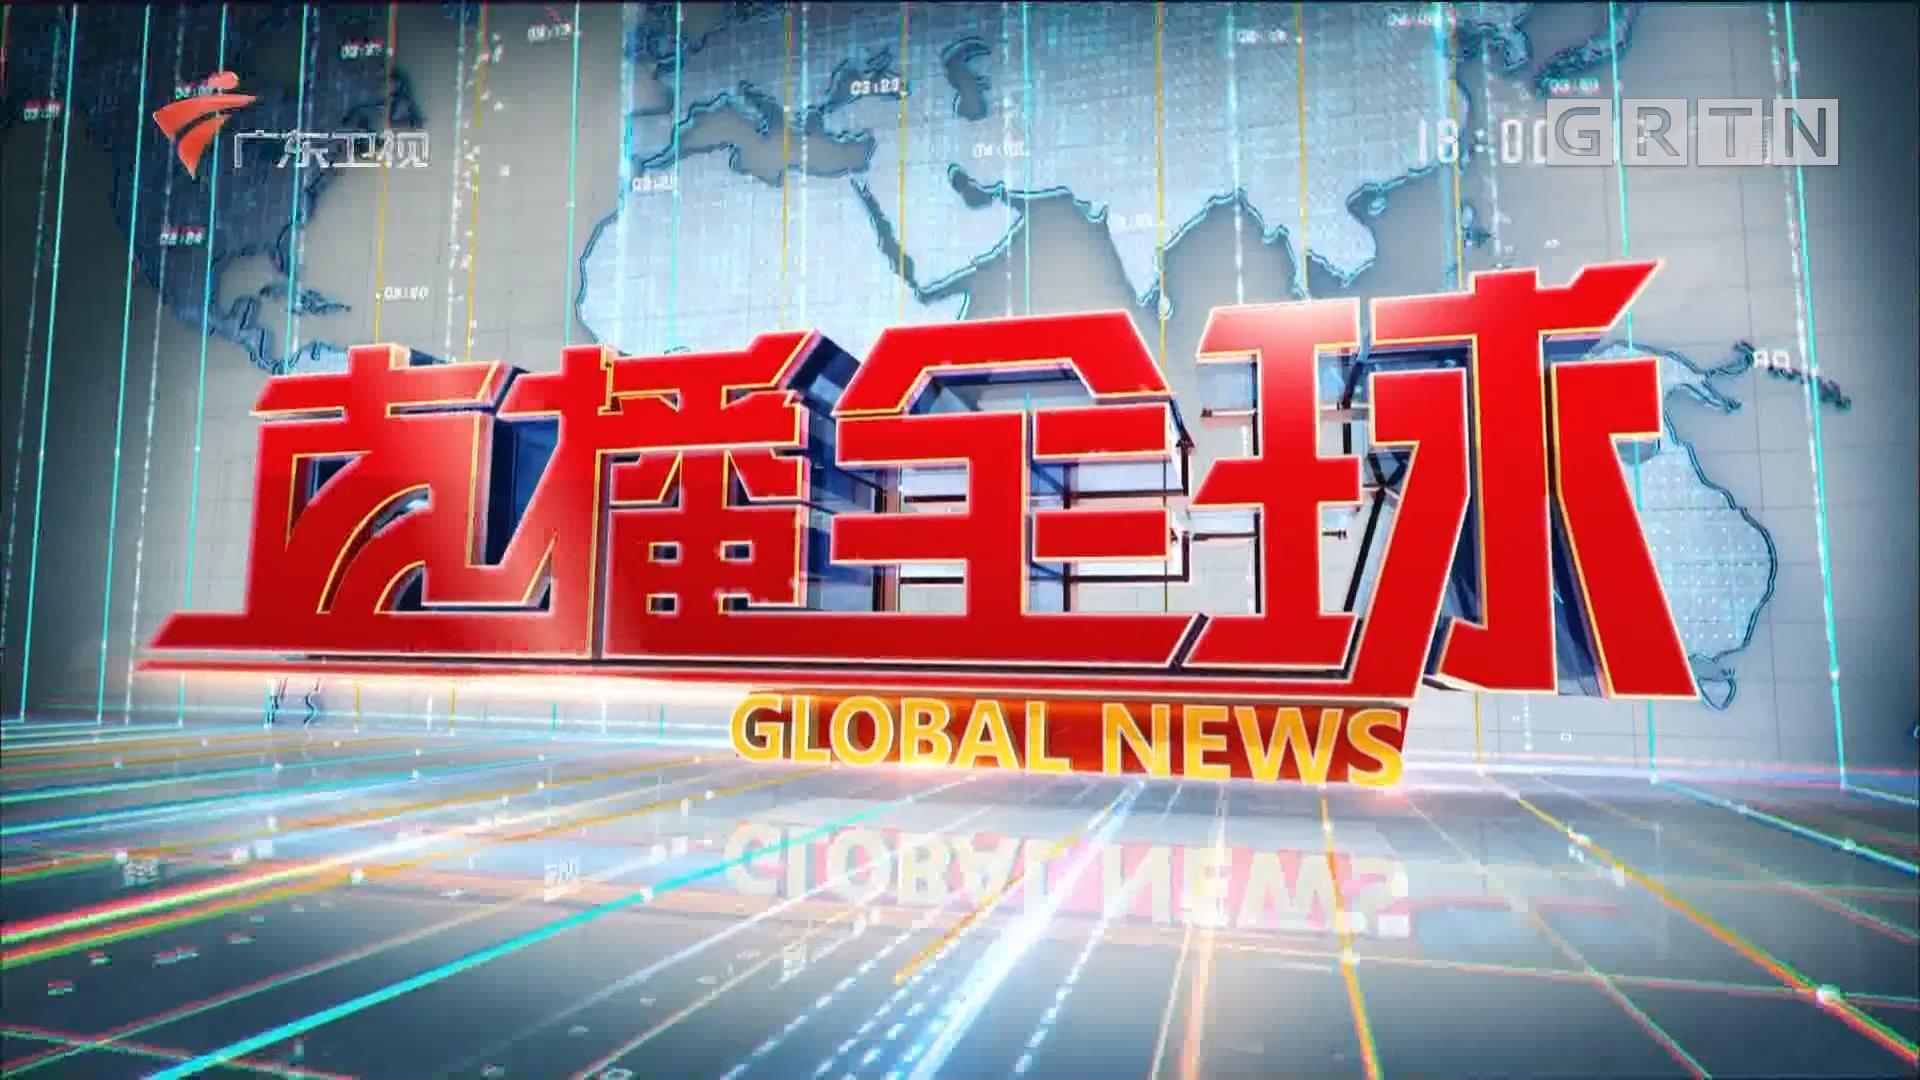 [HD][2018-12-13]直播全球:国家公祭日 全国多地悼念南京大屠杀遇难同胞:为30万遇难同胞降半旗致哀